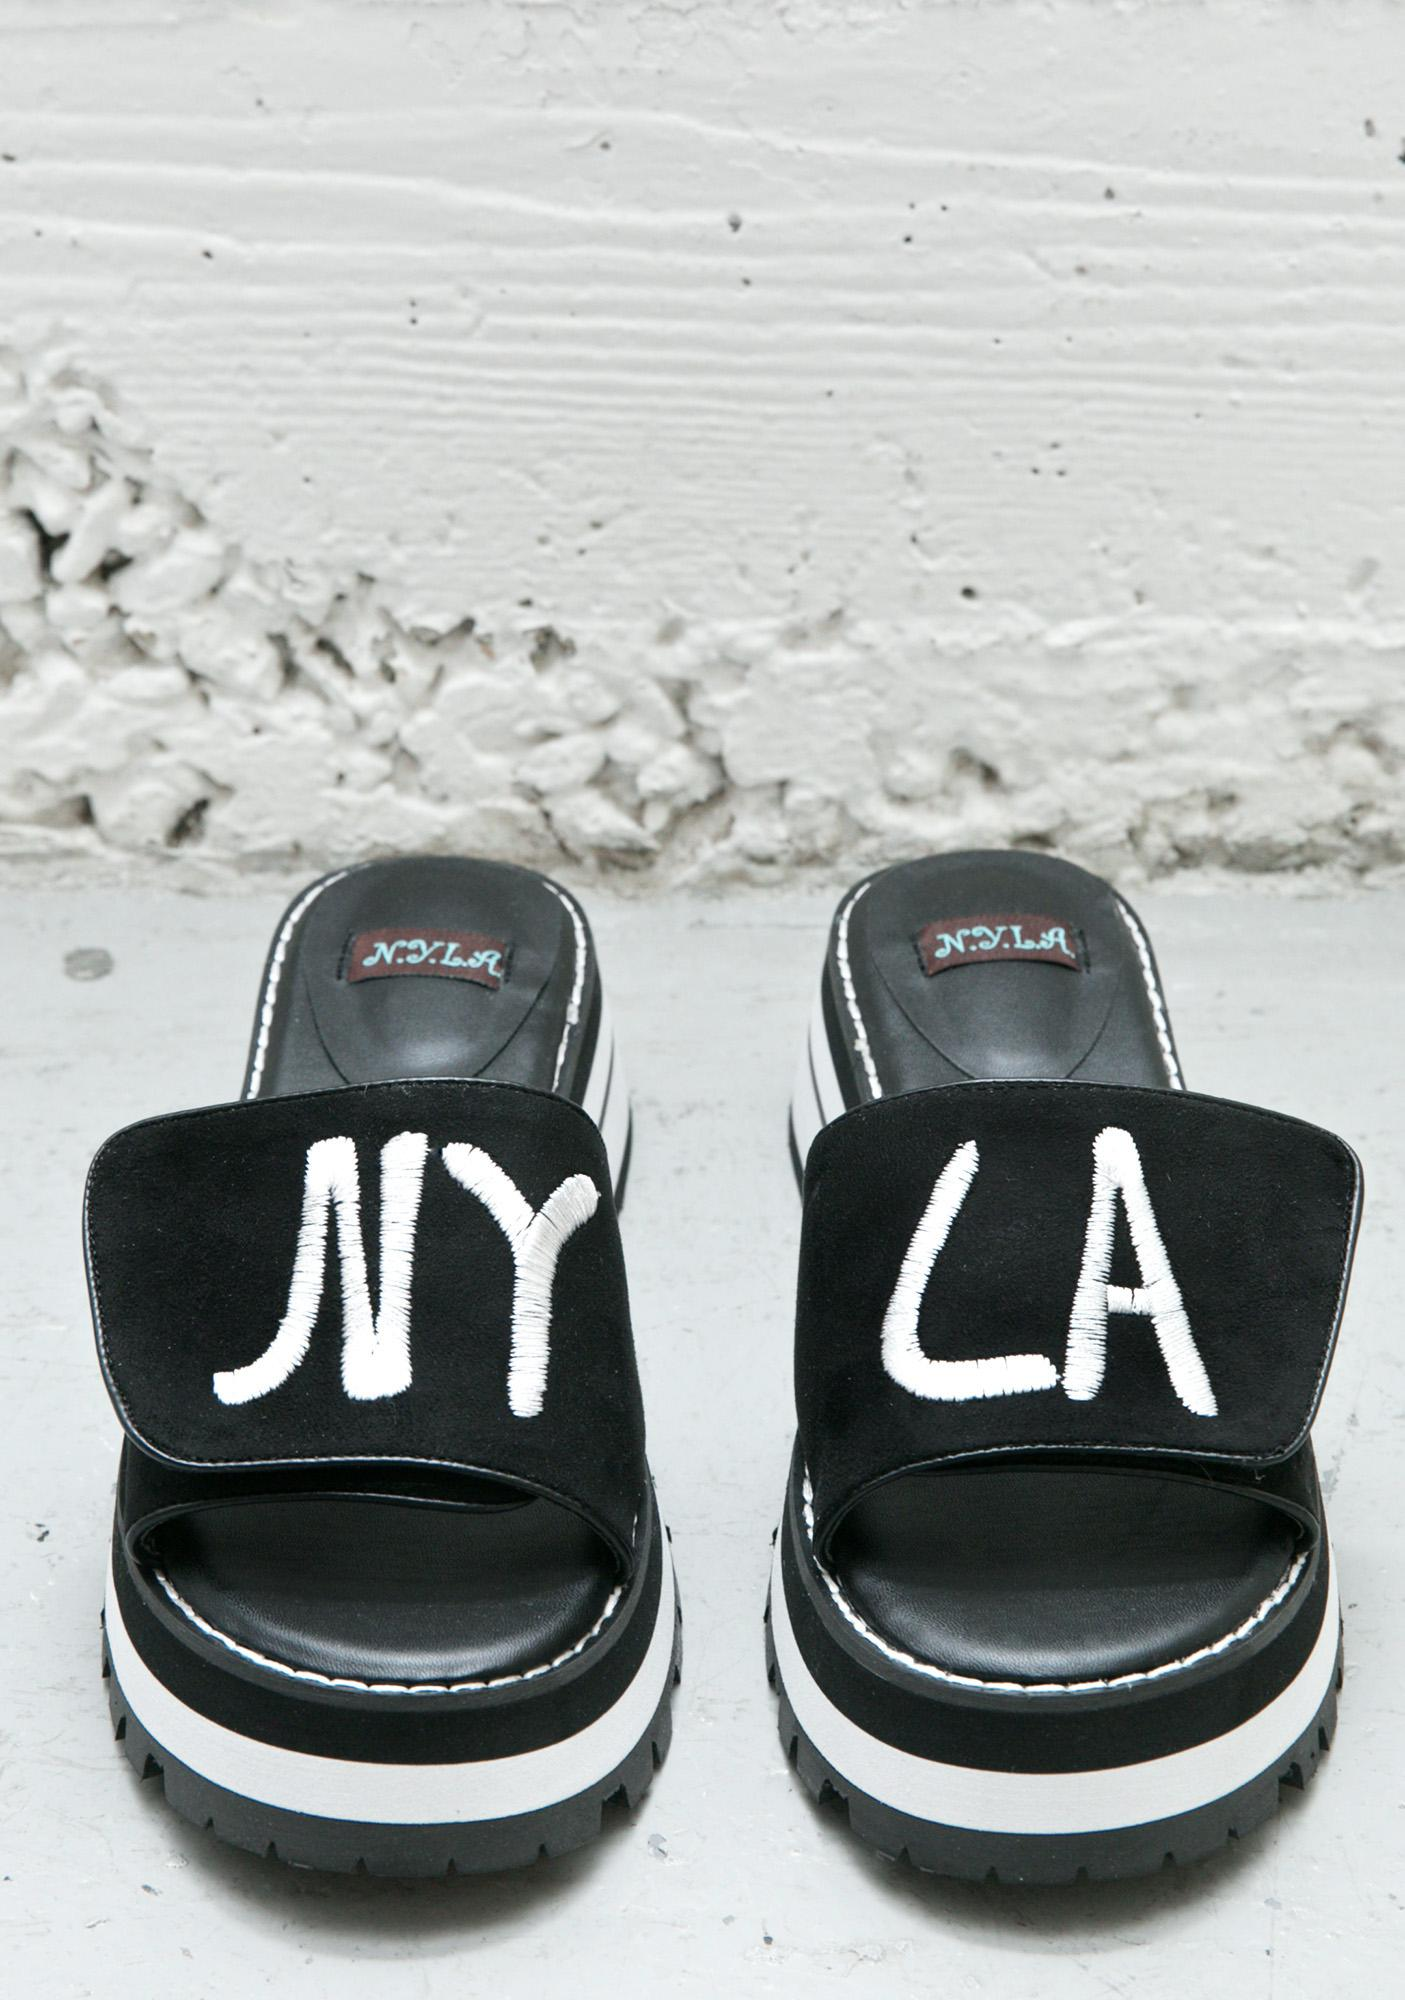 NY LA Slide Sandals